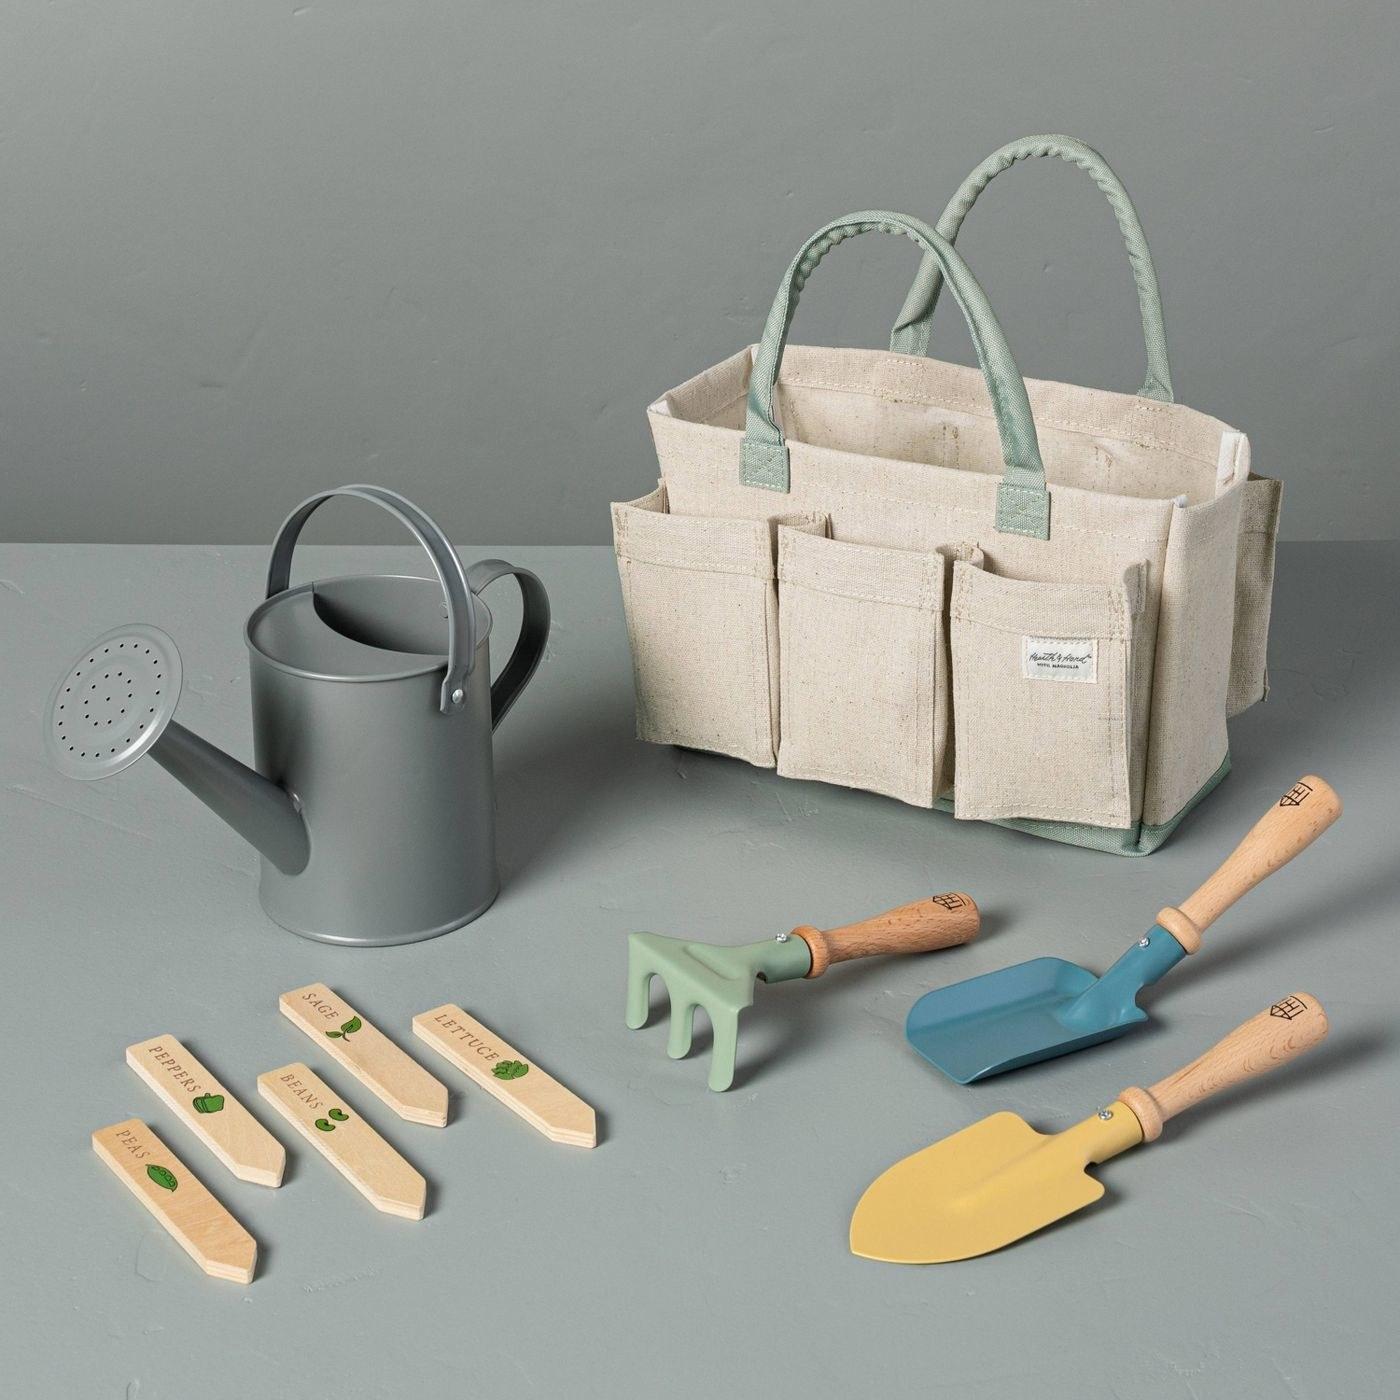 green, tan, blue and yellow gardening kit